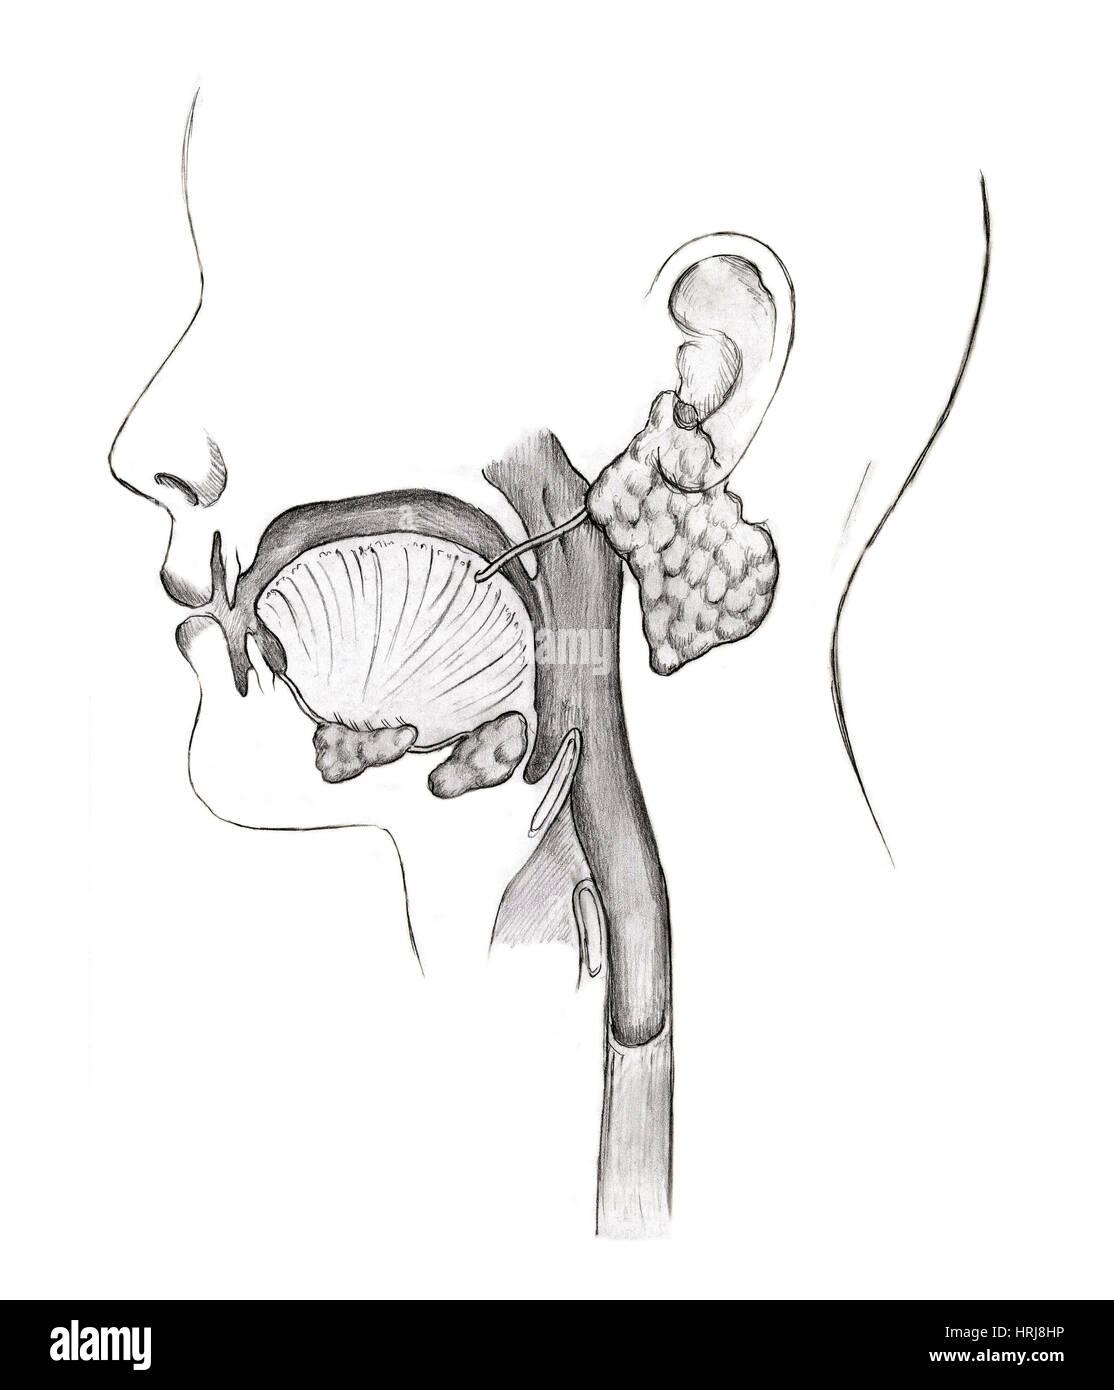 Mouth Anatomy Diagram Stockfotos & Mouth Anatomy Diagram Bilder - Alamy